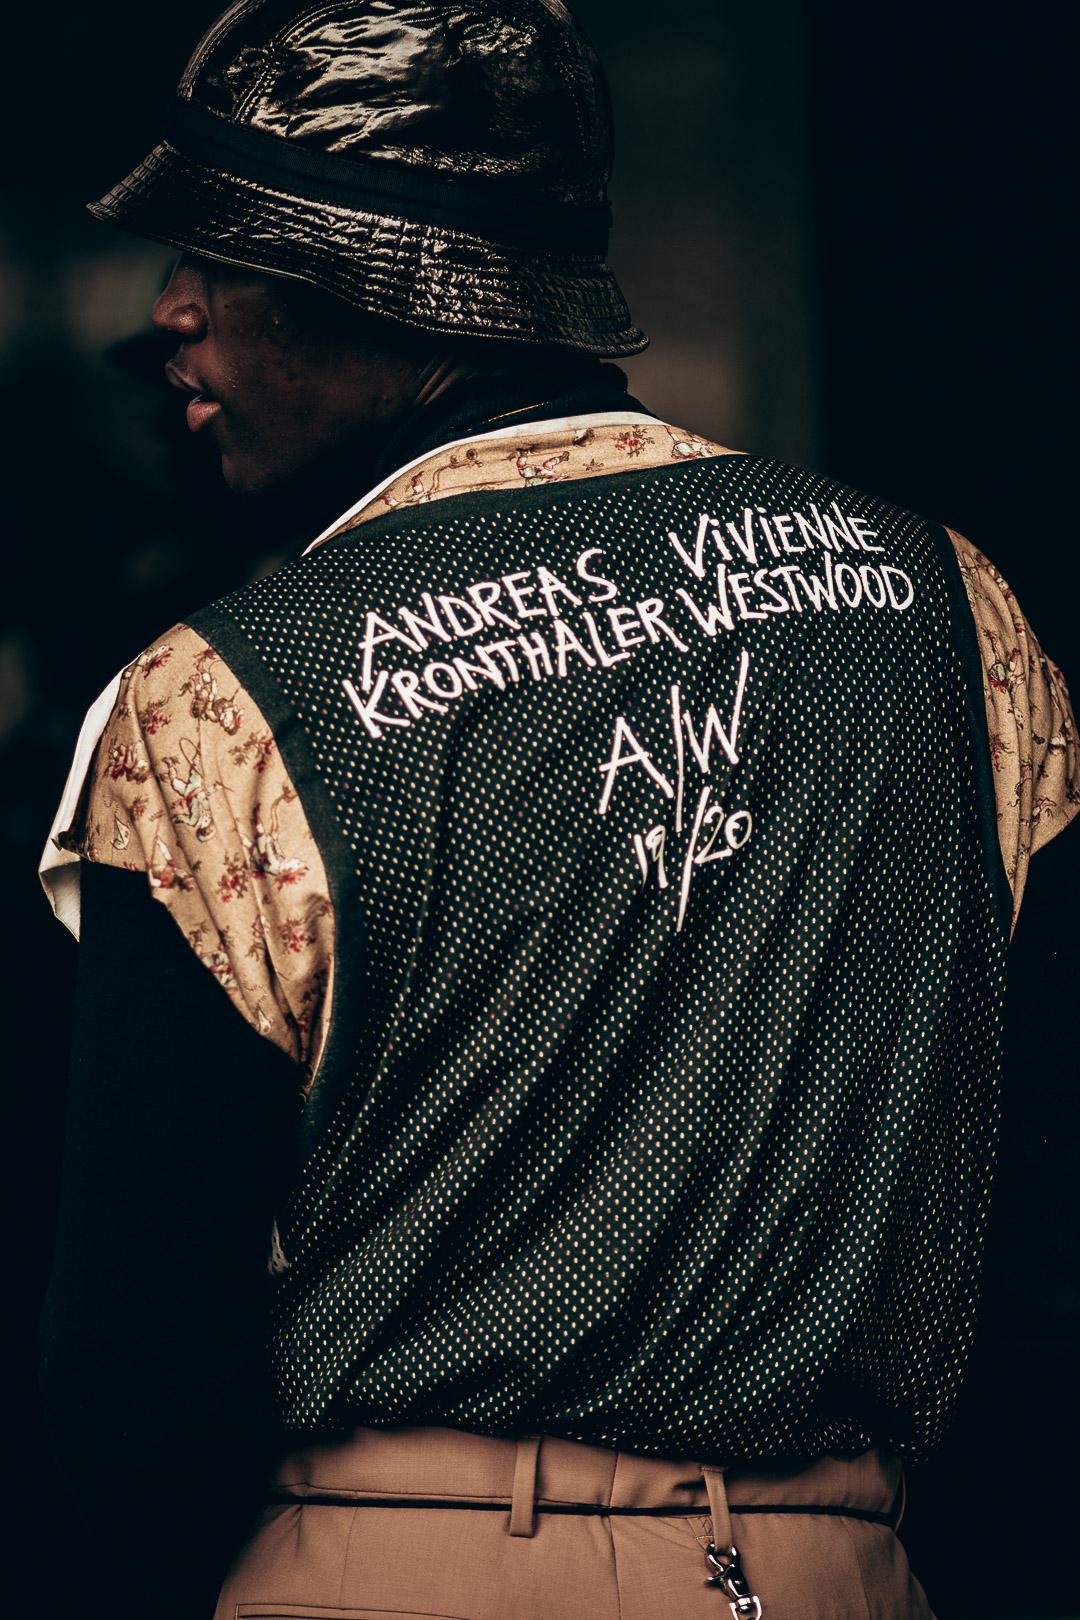 street style photography at Paris Fashion Week Vivienne Westwood